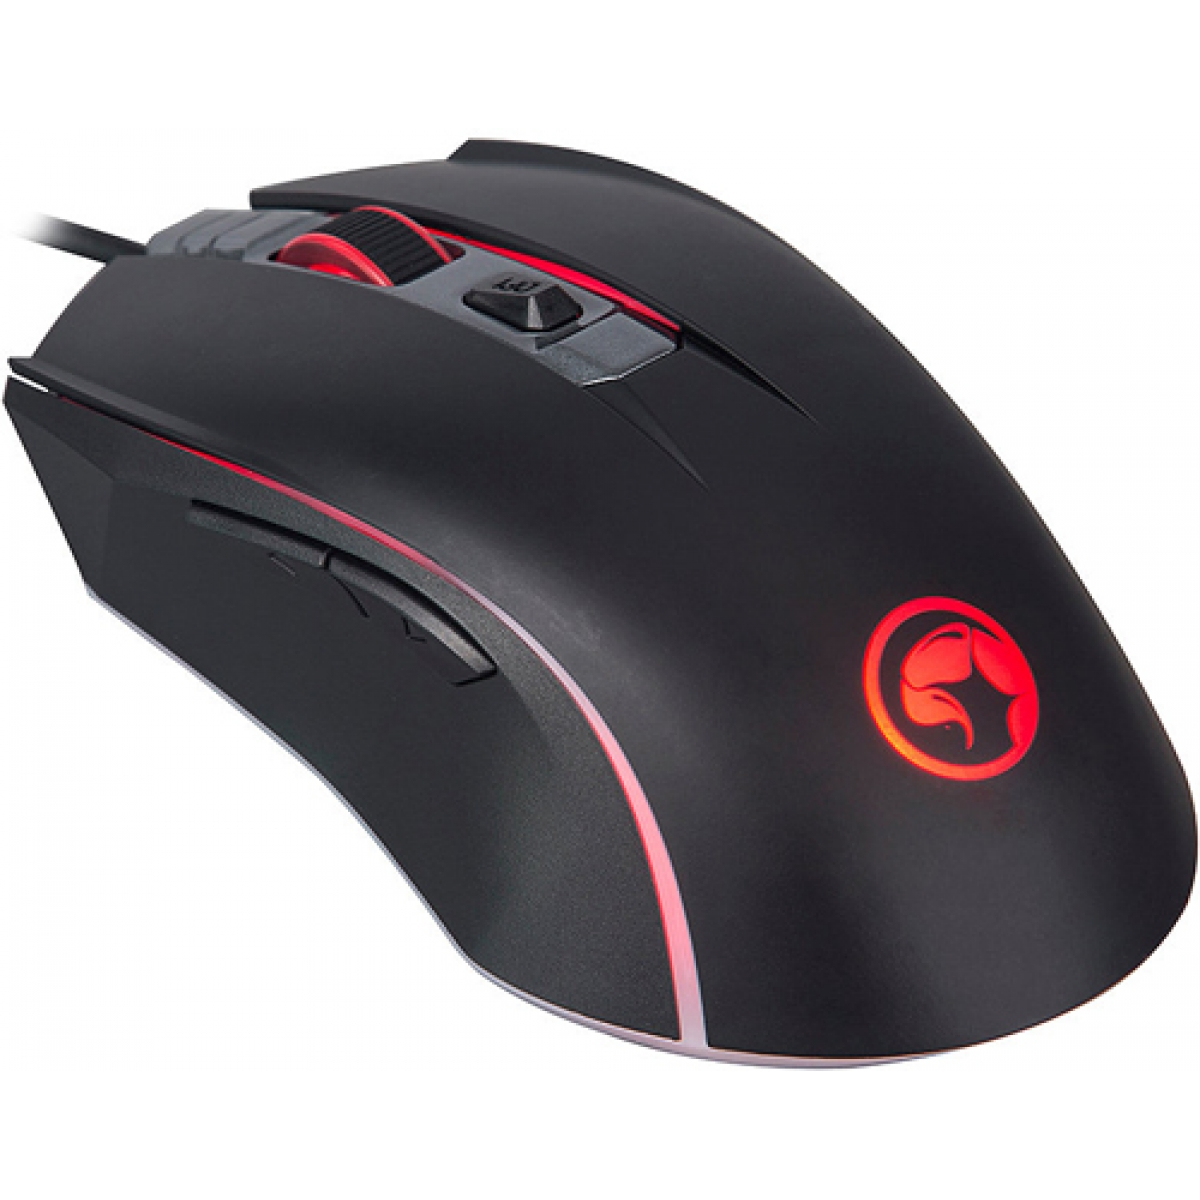 Mouse Marvo Gamer G930 6 Botões 4000 DPI LED RGB